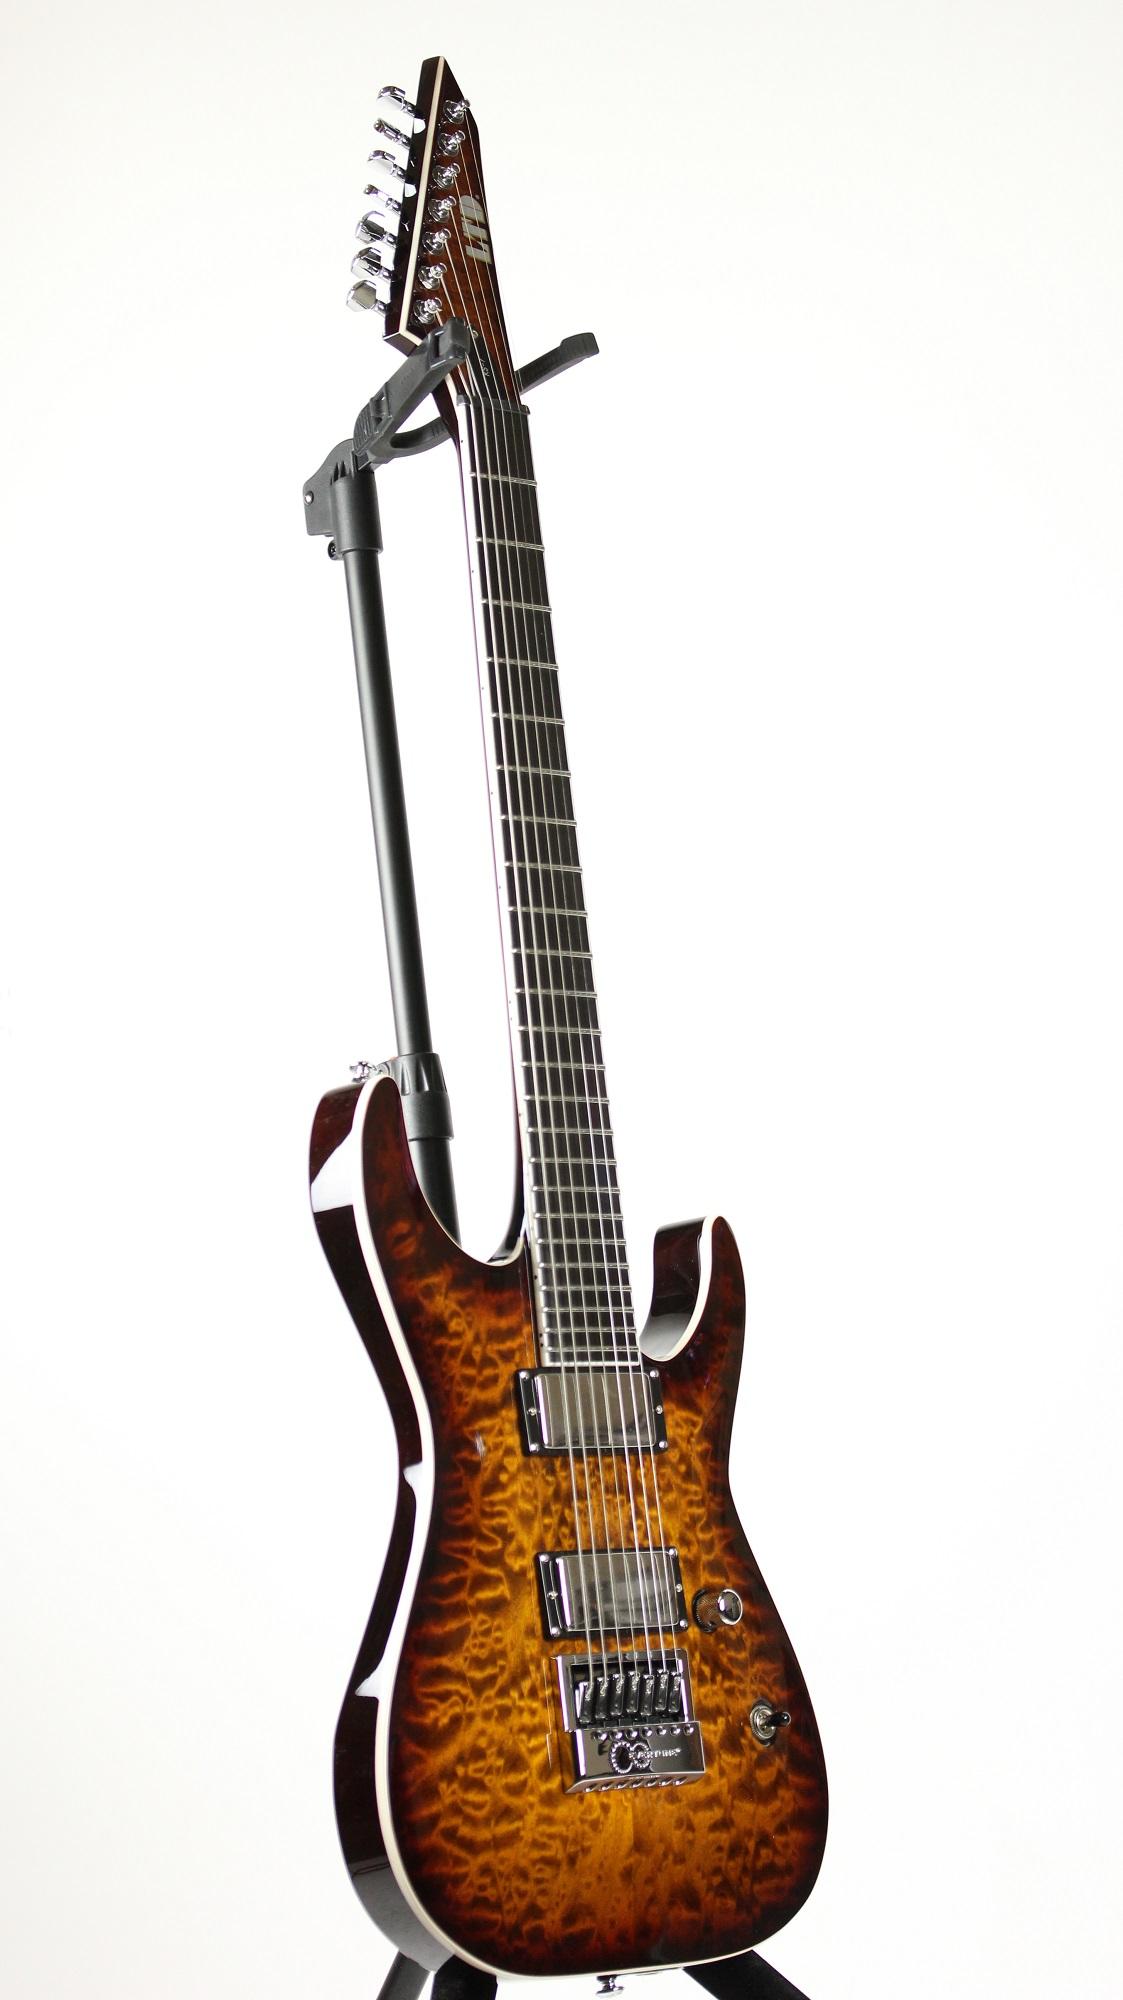 Kansas Brand Electric Guitar : esp ltd ken susi ks 7 qm et evertune electric guitar signed 6 ~ Russianpoet.info Haus und Dekorationen